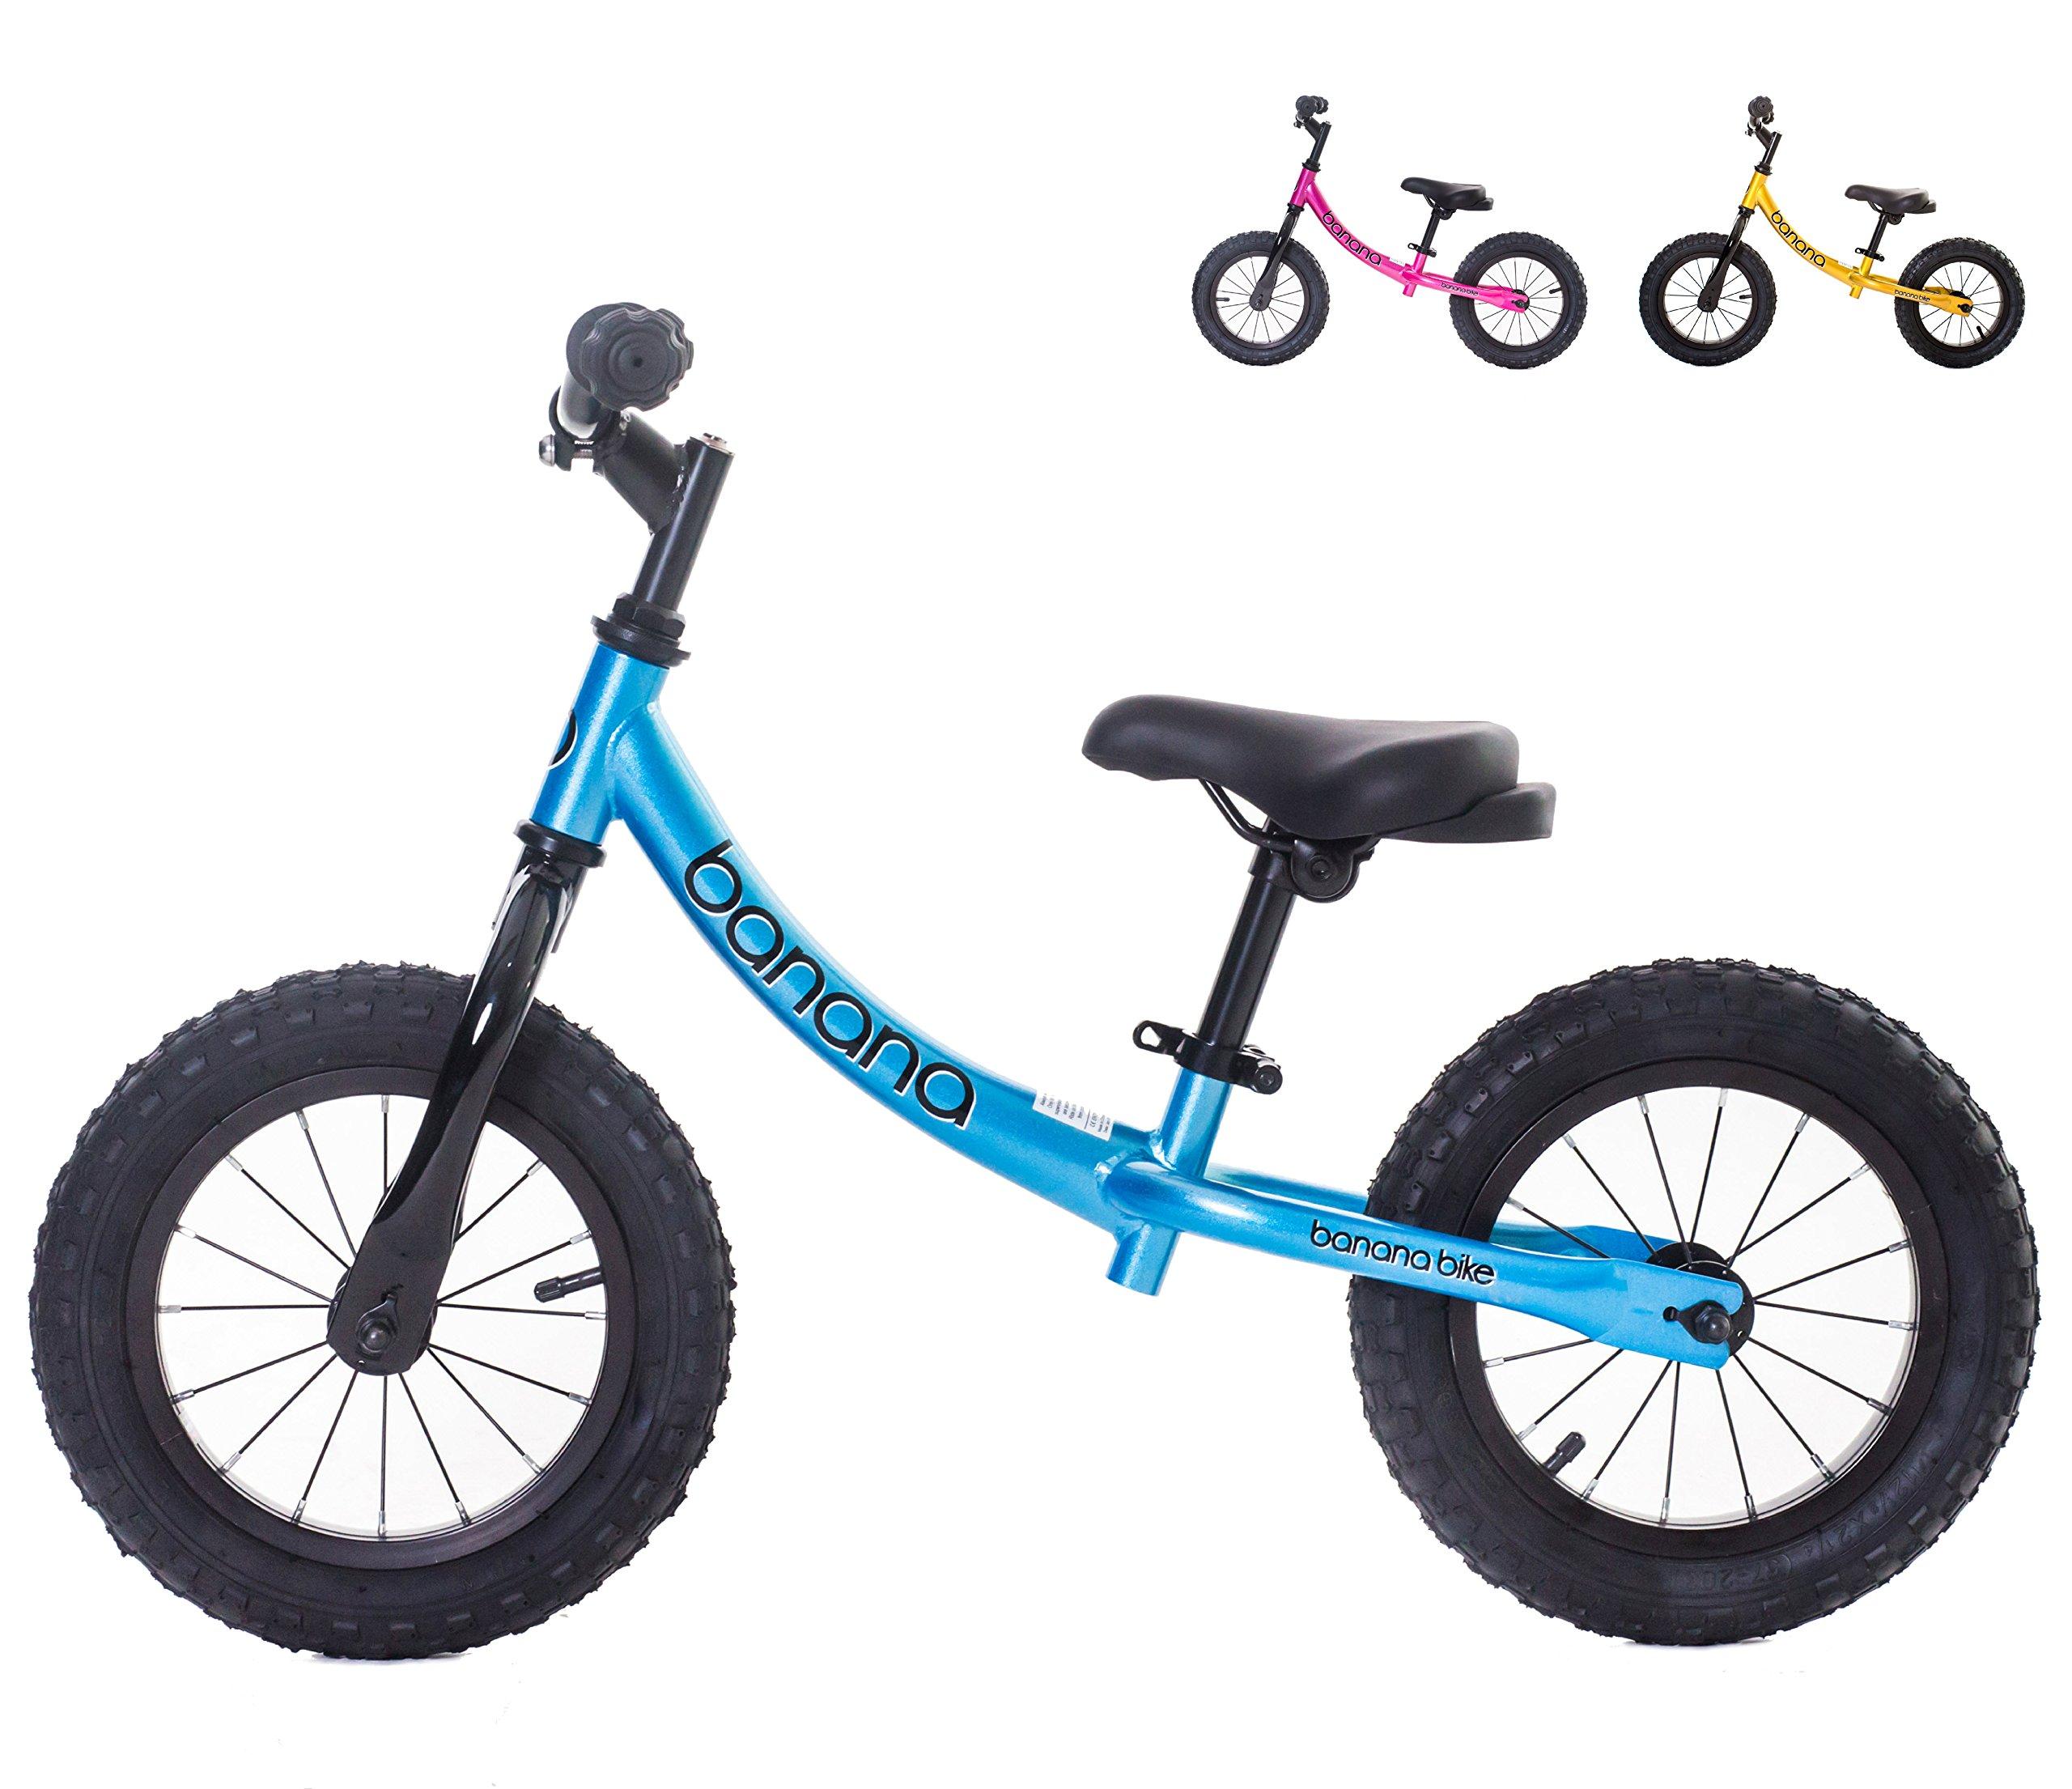 04011c90a24 Buy Banana Bike GT - Balance Bike for Kids in Cheap Price on Alibaba.com